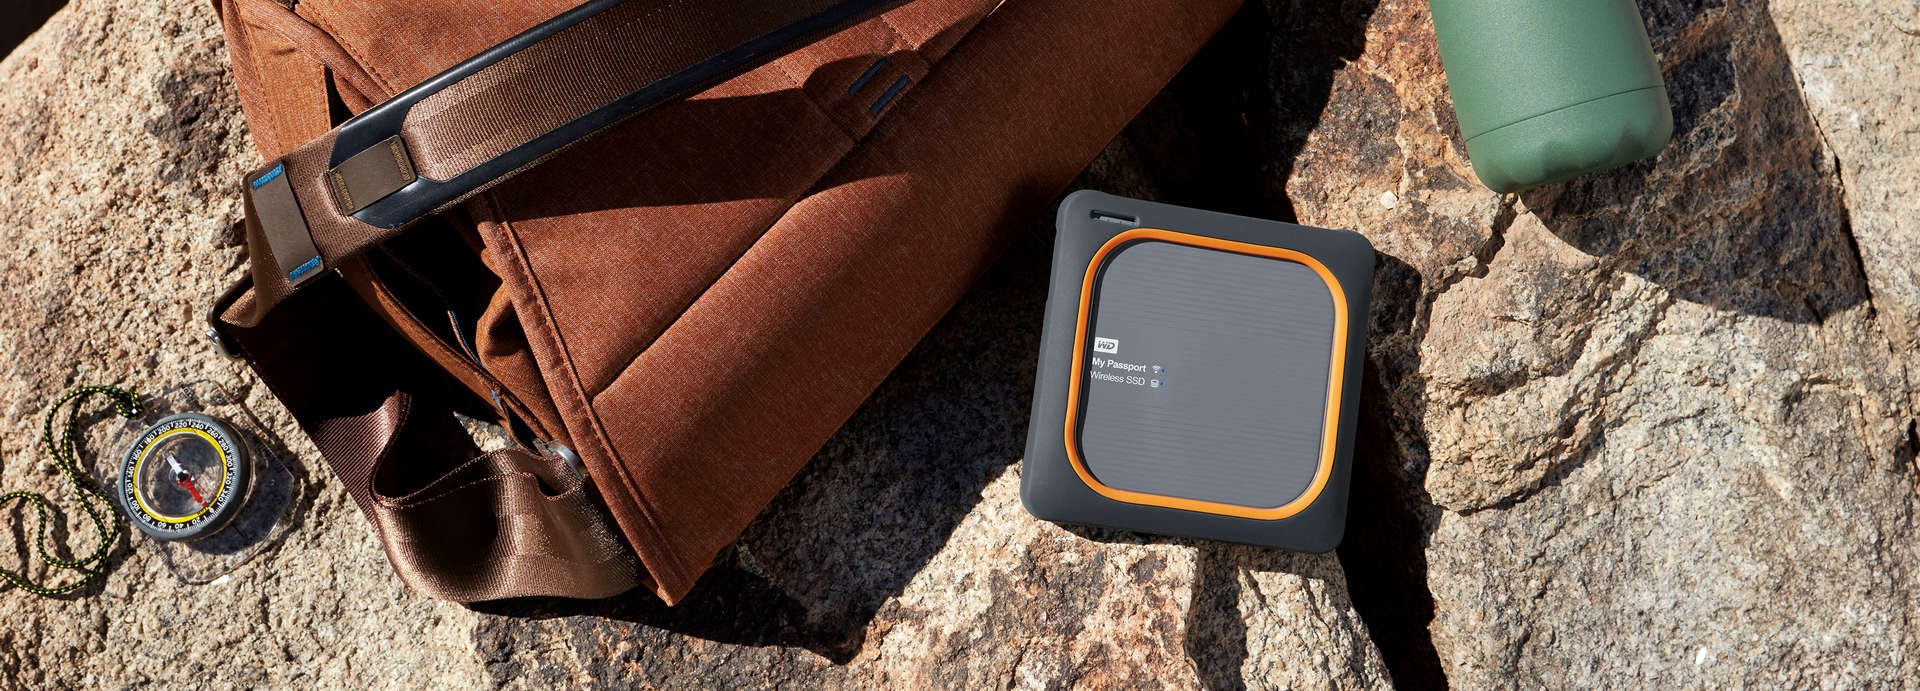 Ổ cứng gắn ngoài WD My Passport Wireless SSD 500GB (WDBAMJ5000AGY-PESN)